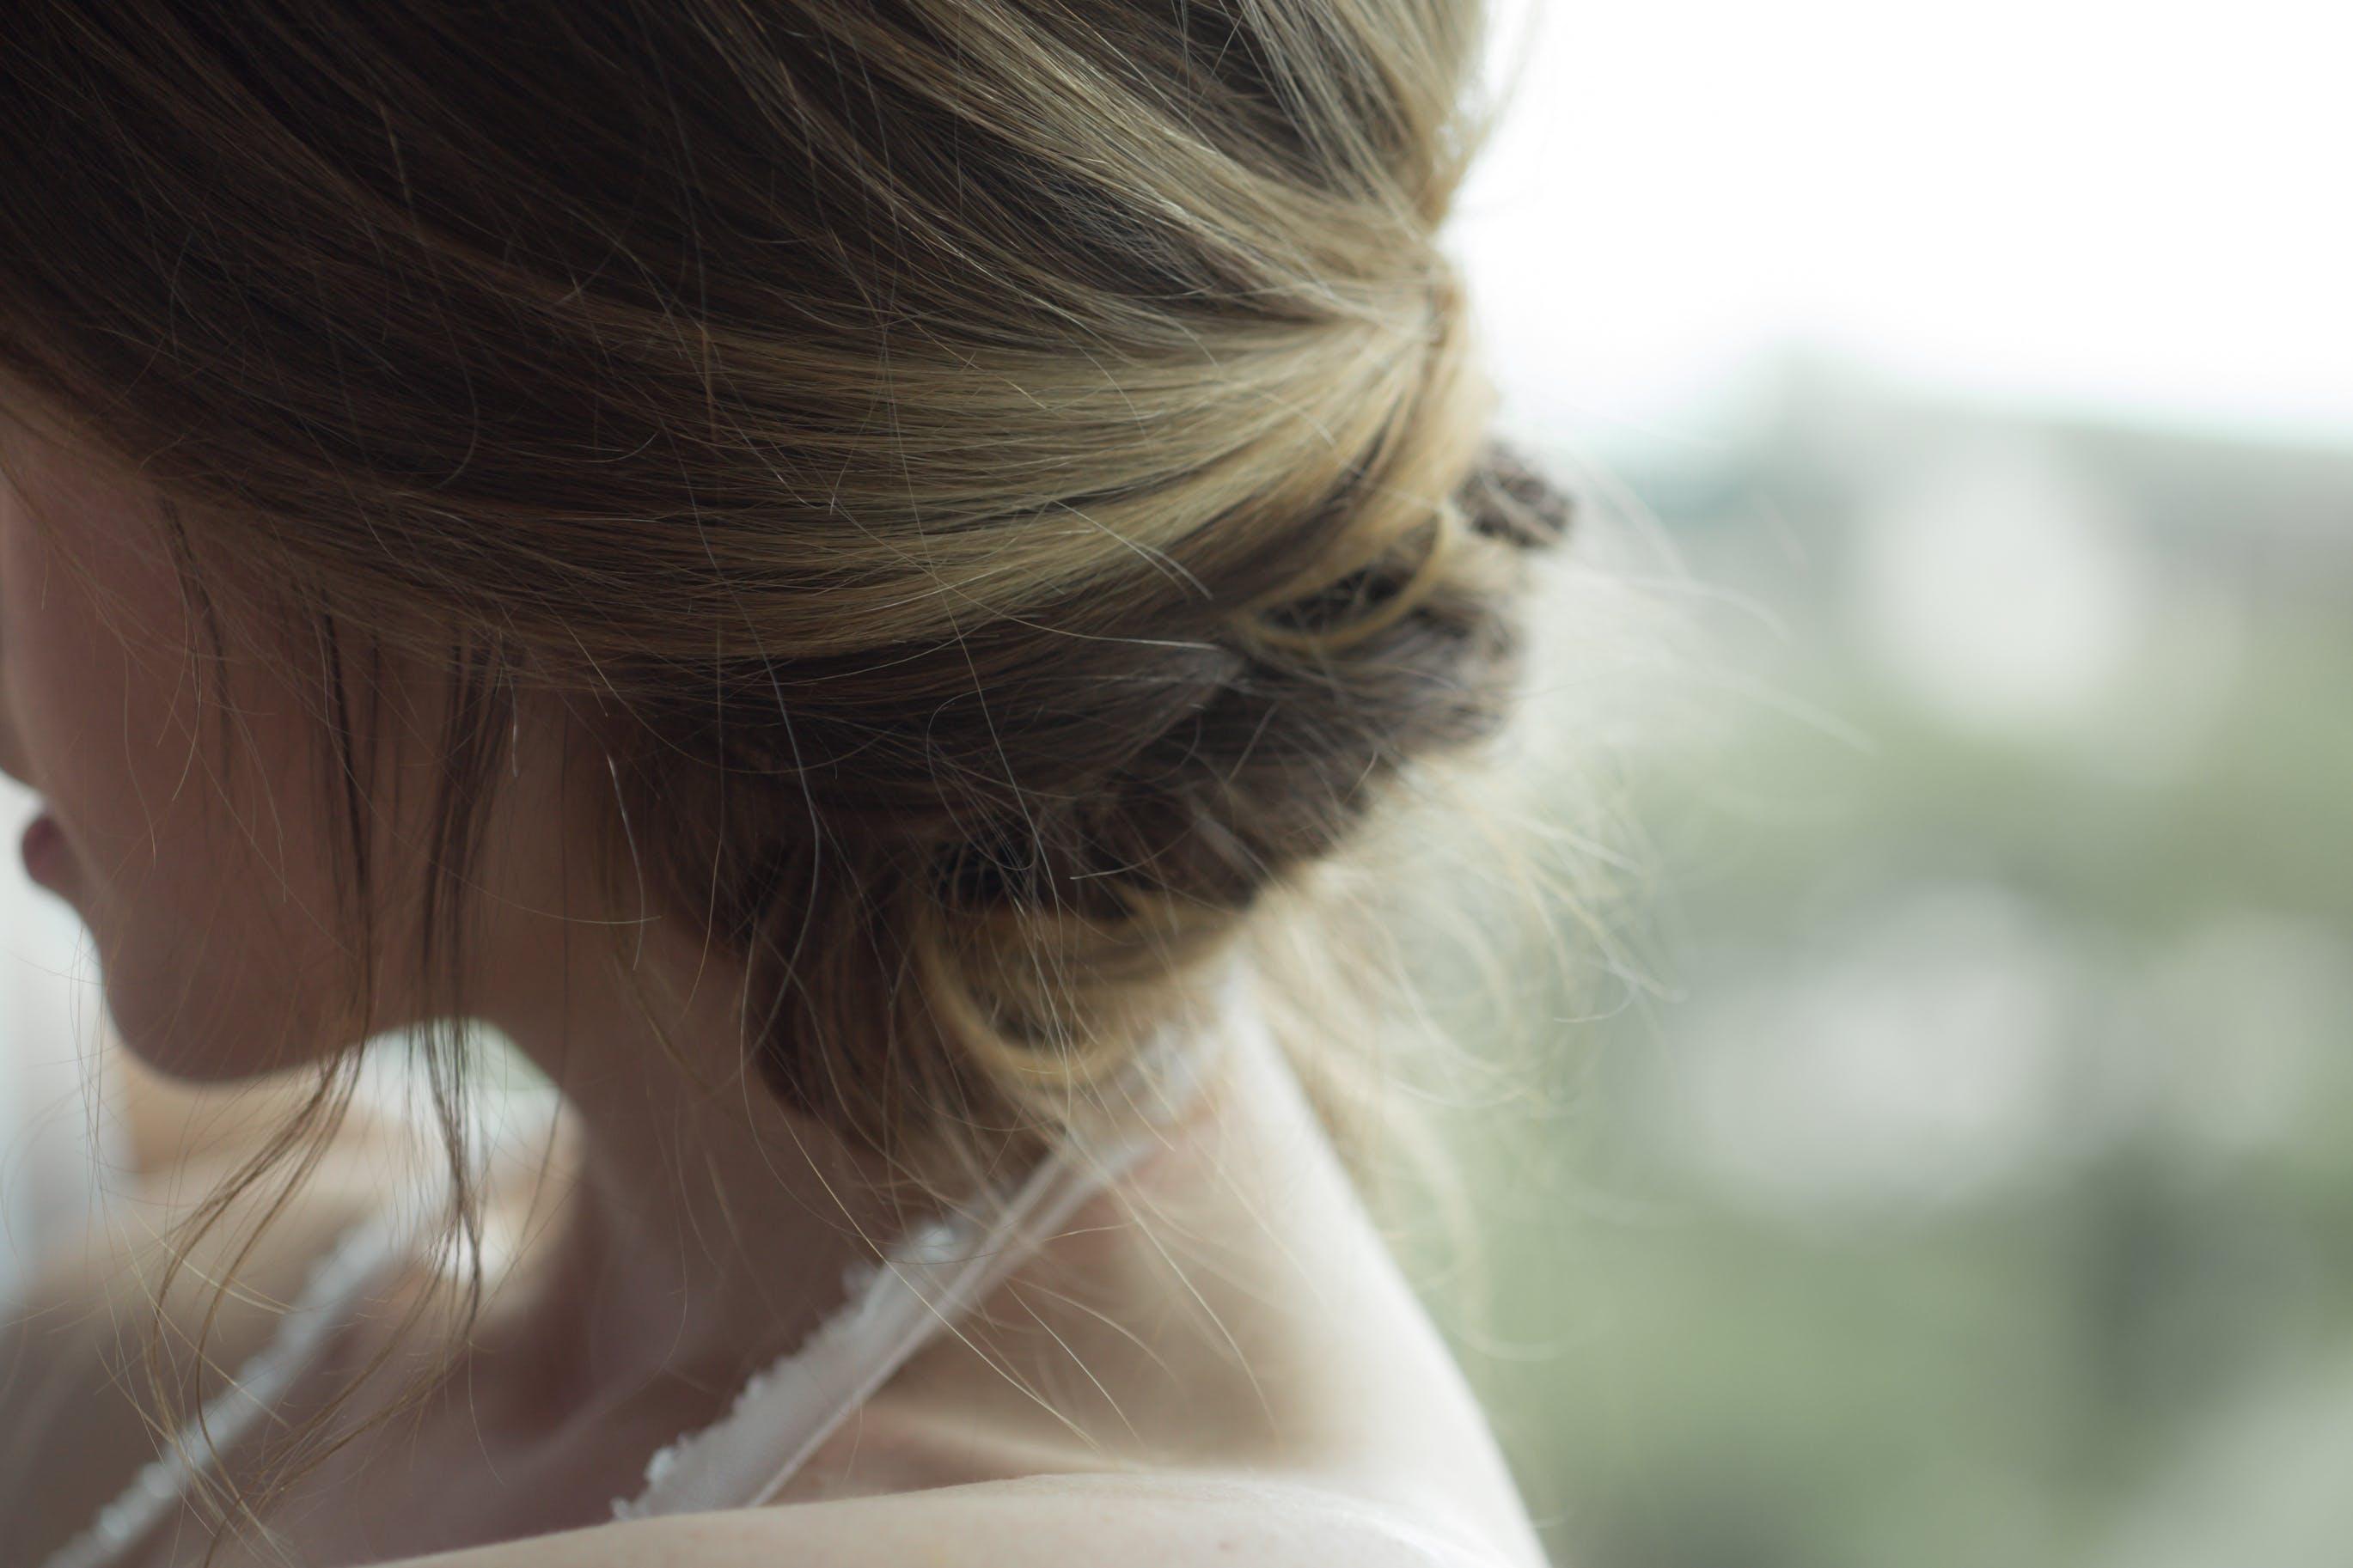 Woman Wearing White Halter-neck Top